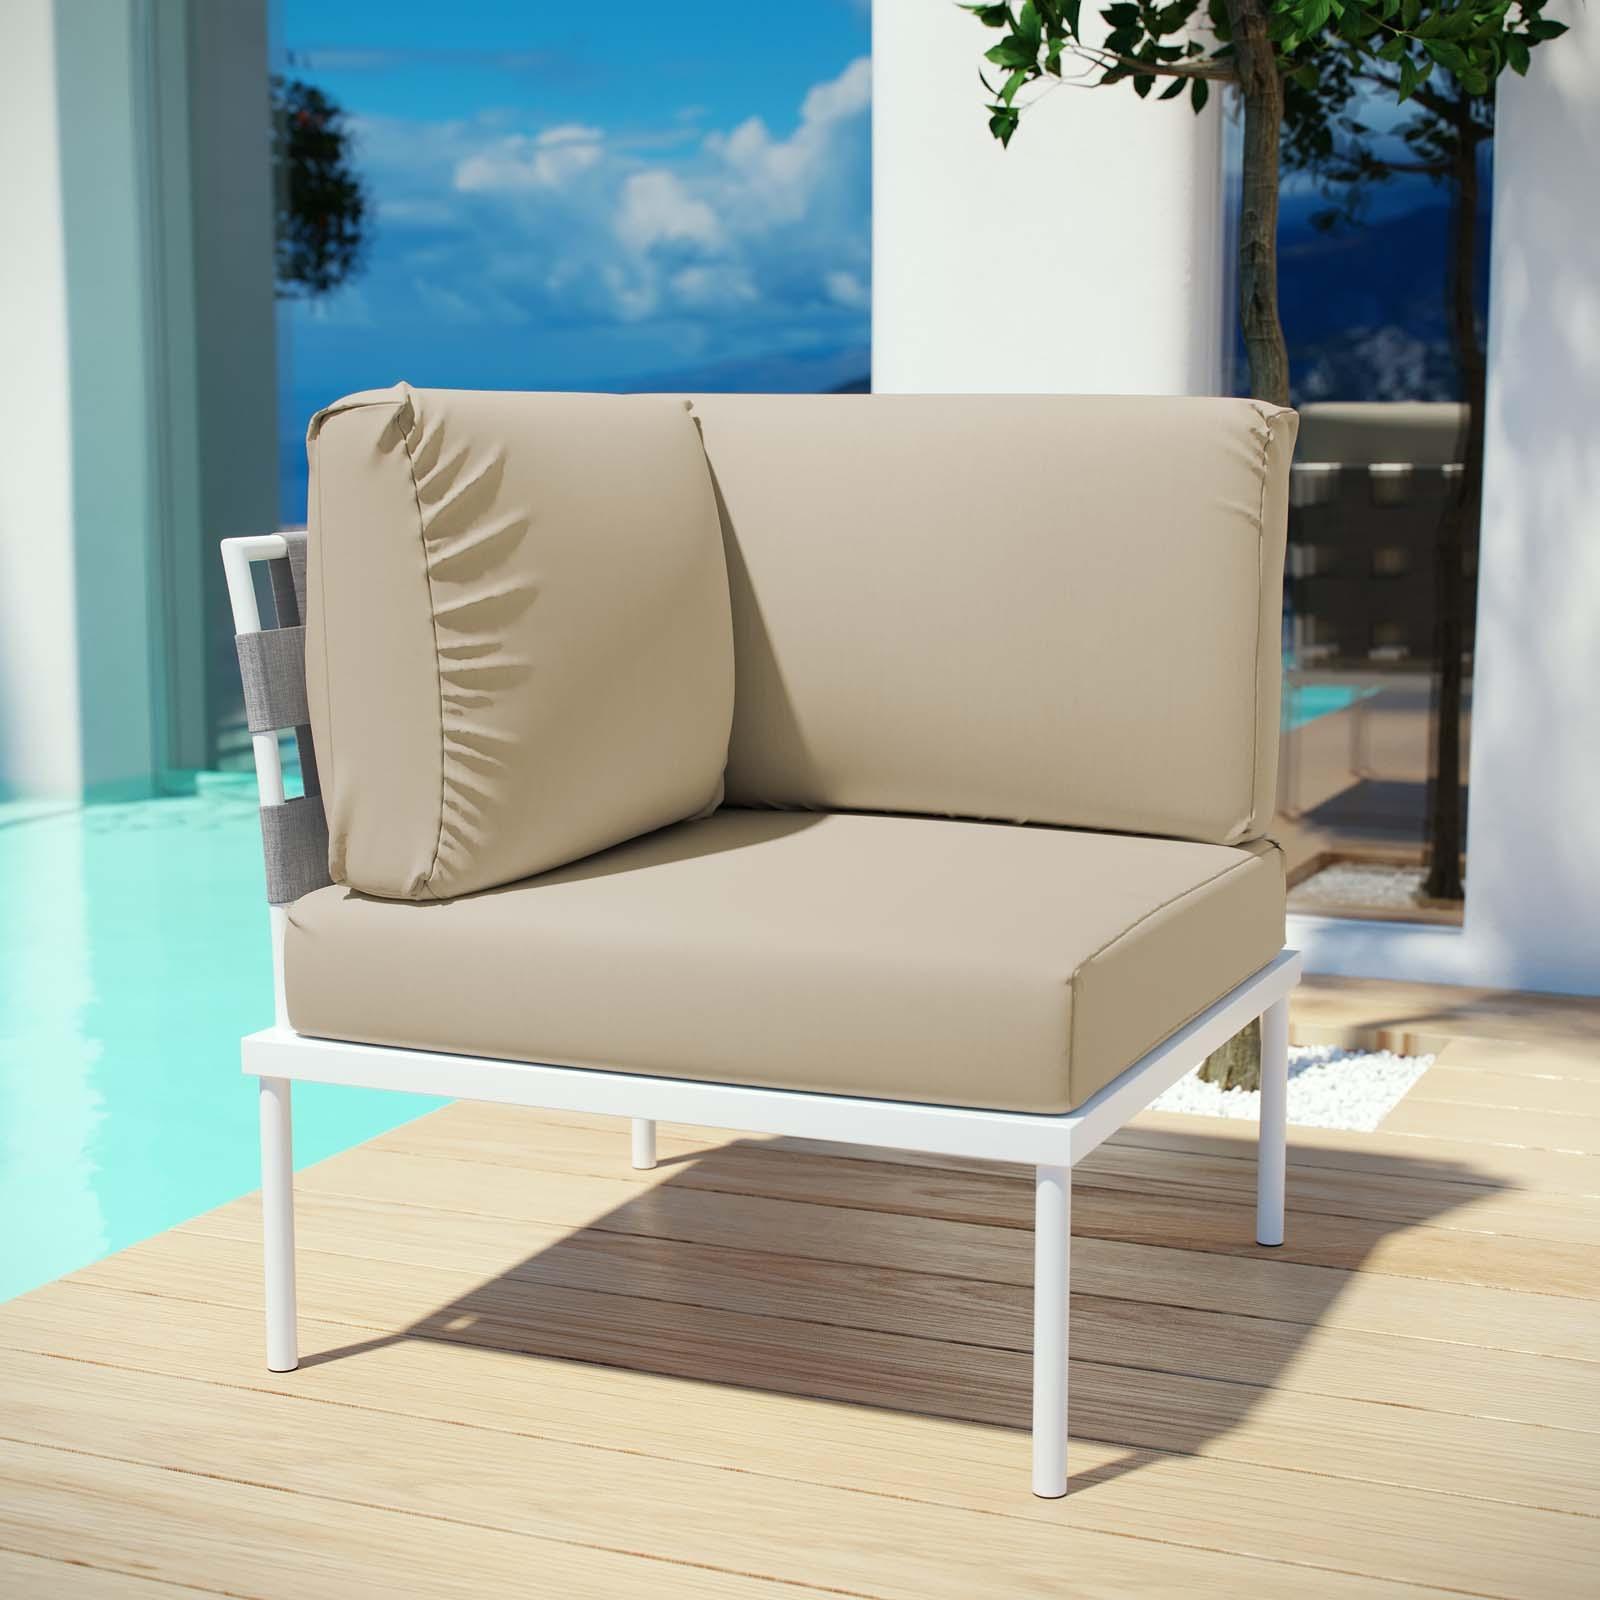 Harmony Outdoor Patio Aluminum Corner Sofa in White Beige